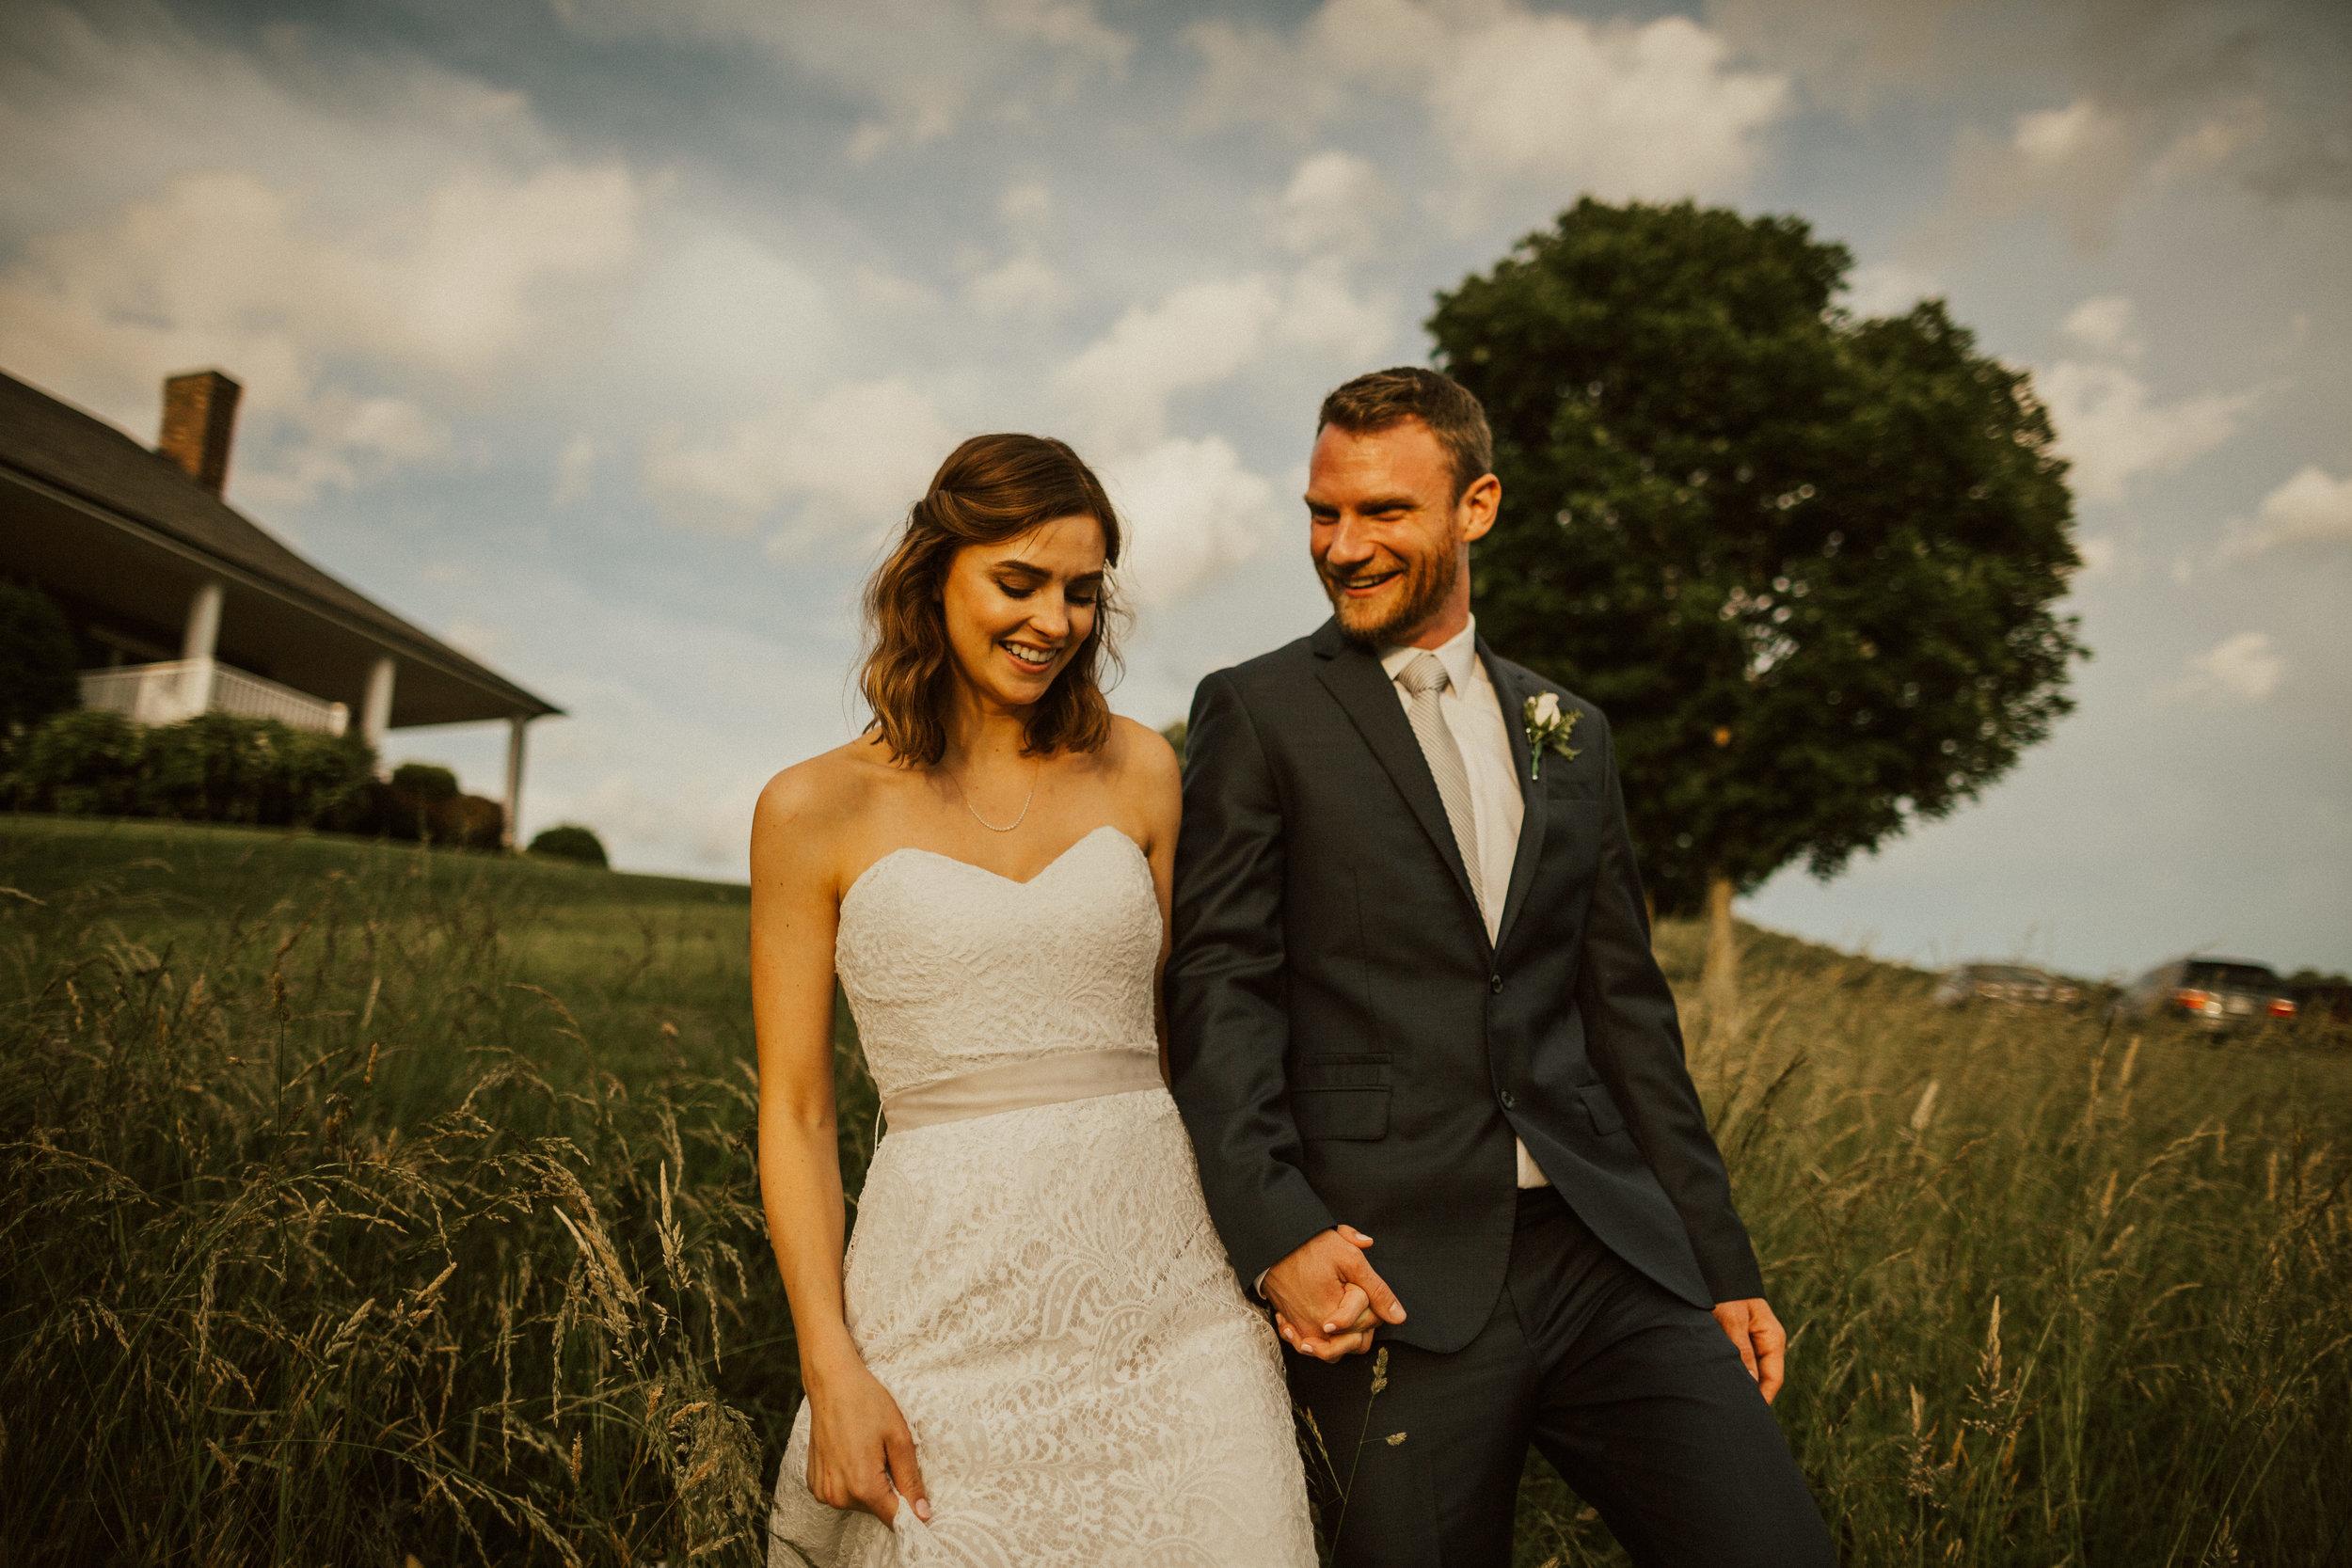 Nashville Wedding Photography by Saul Cervantes Photography-19.jpg